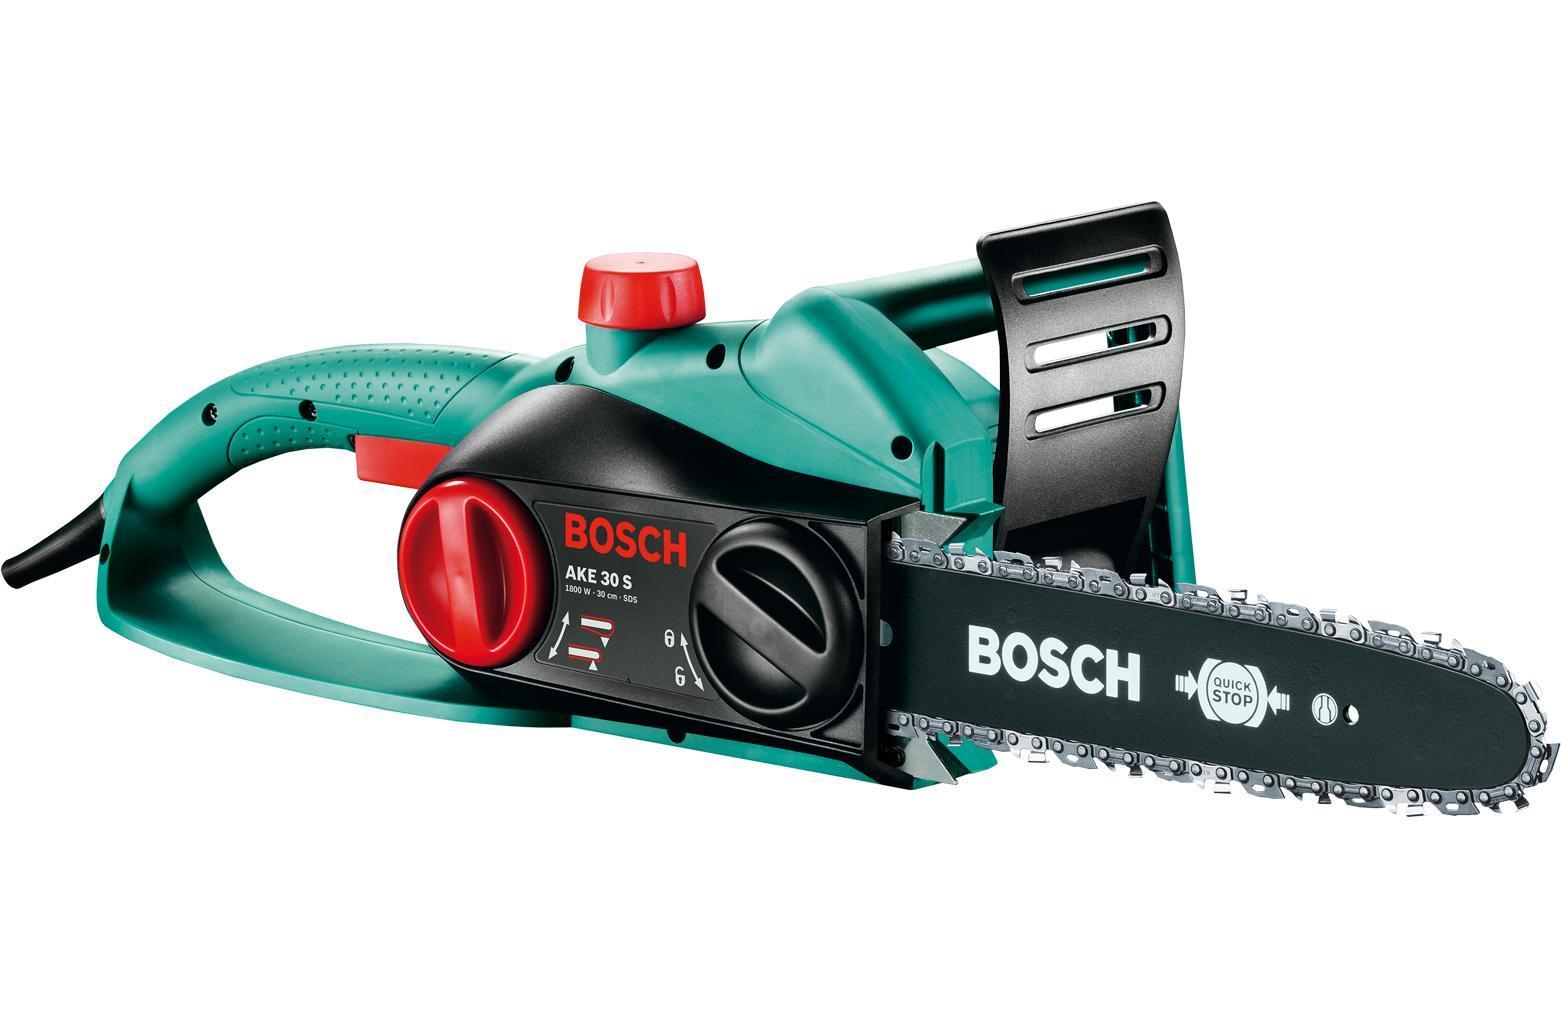 Цепная пила Bosch AKE 30 S 0600834400 цепь для пилы bosch ake 30 17 8s и 30 li